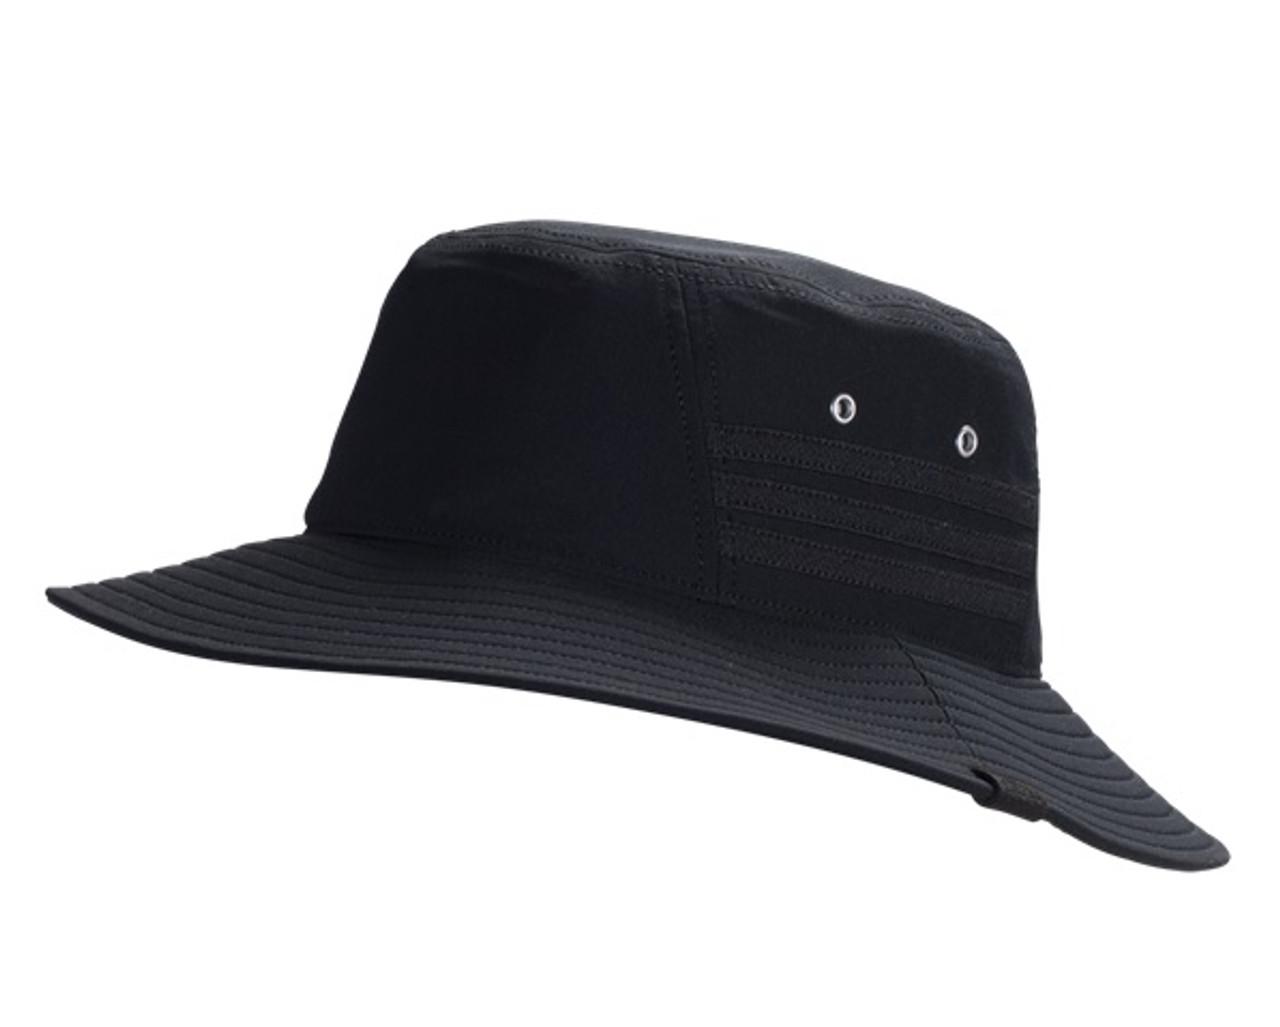 89b887d0d1f Adidas Victory II Bucket Hat - Black Black (012819) - ohp soccer